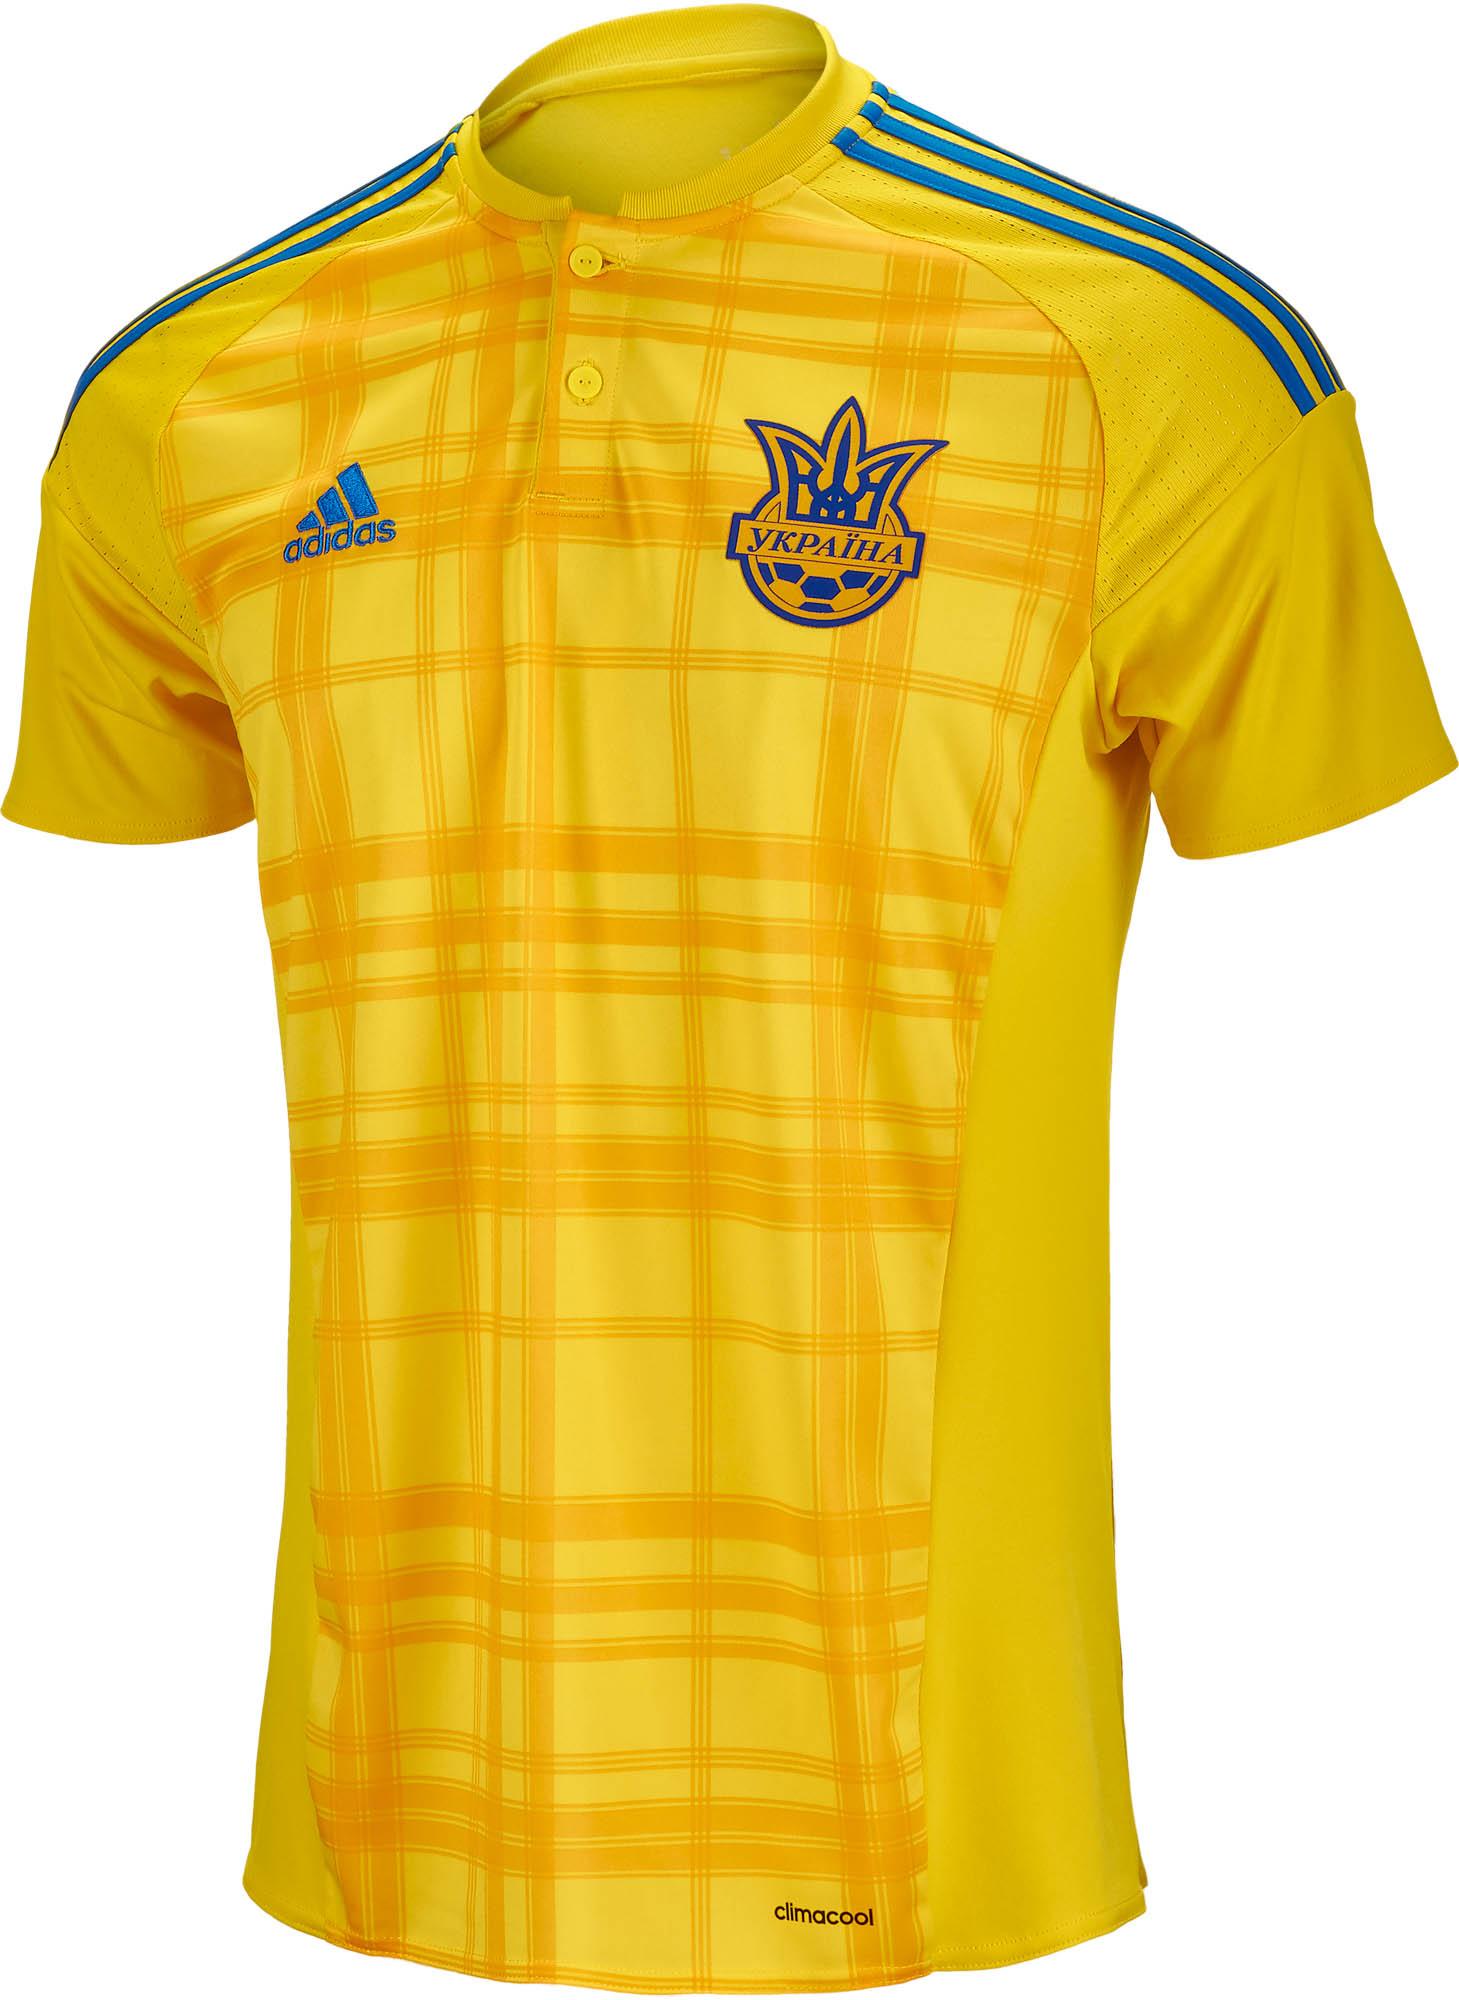 a6d63947dfa adidas Ukraine Away Jersey - 2016 Ukraine Soccer Jerseys